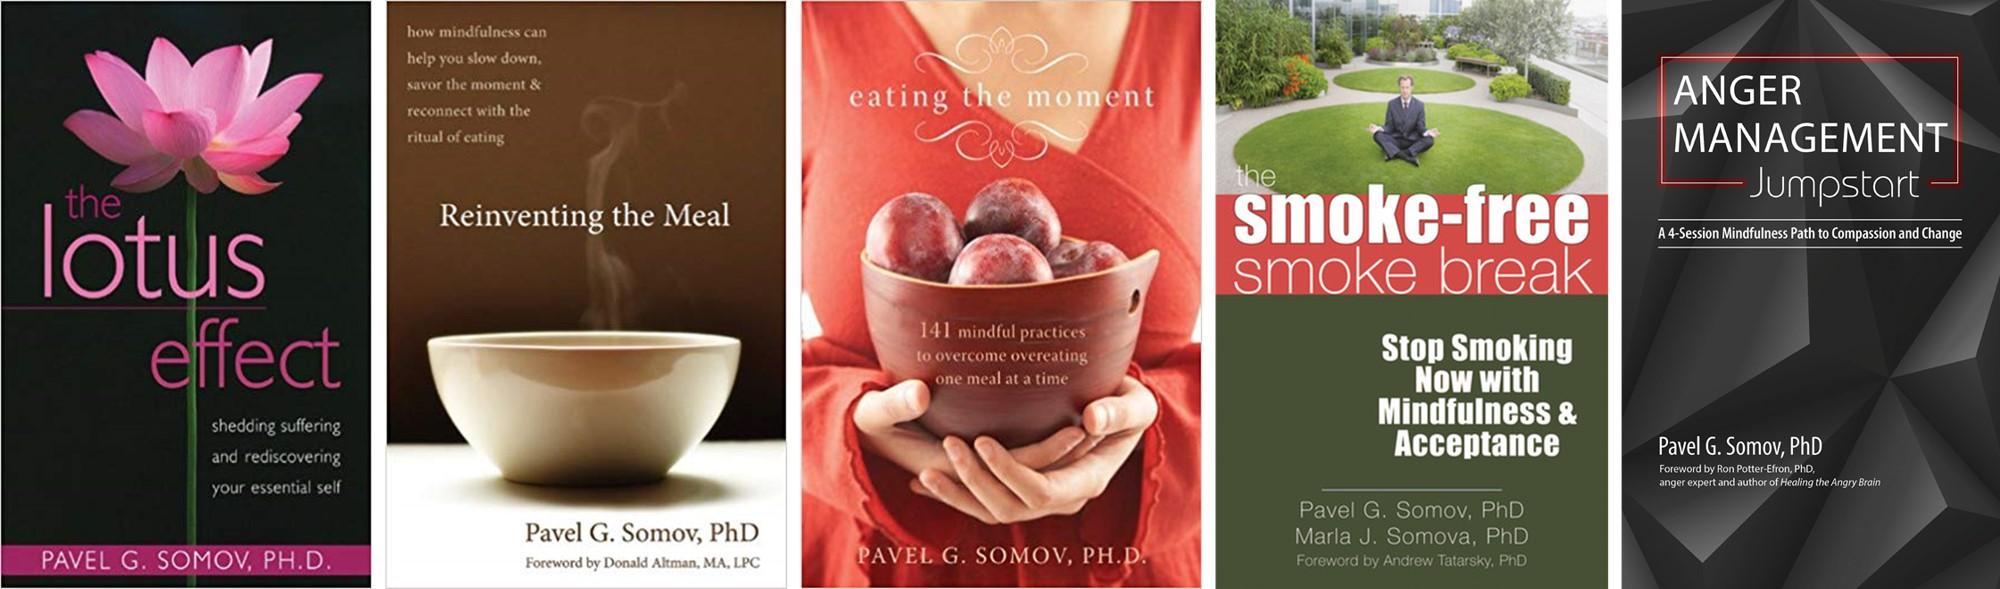 Pavel Somov Books